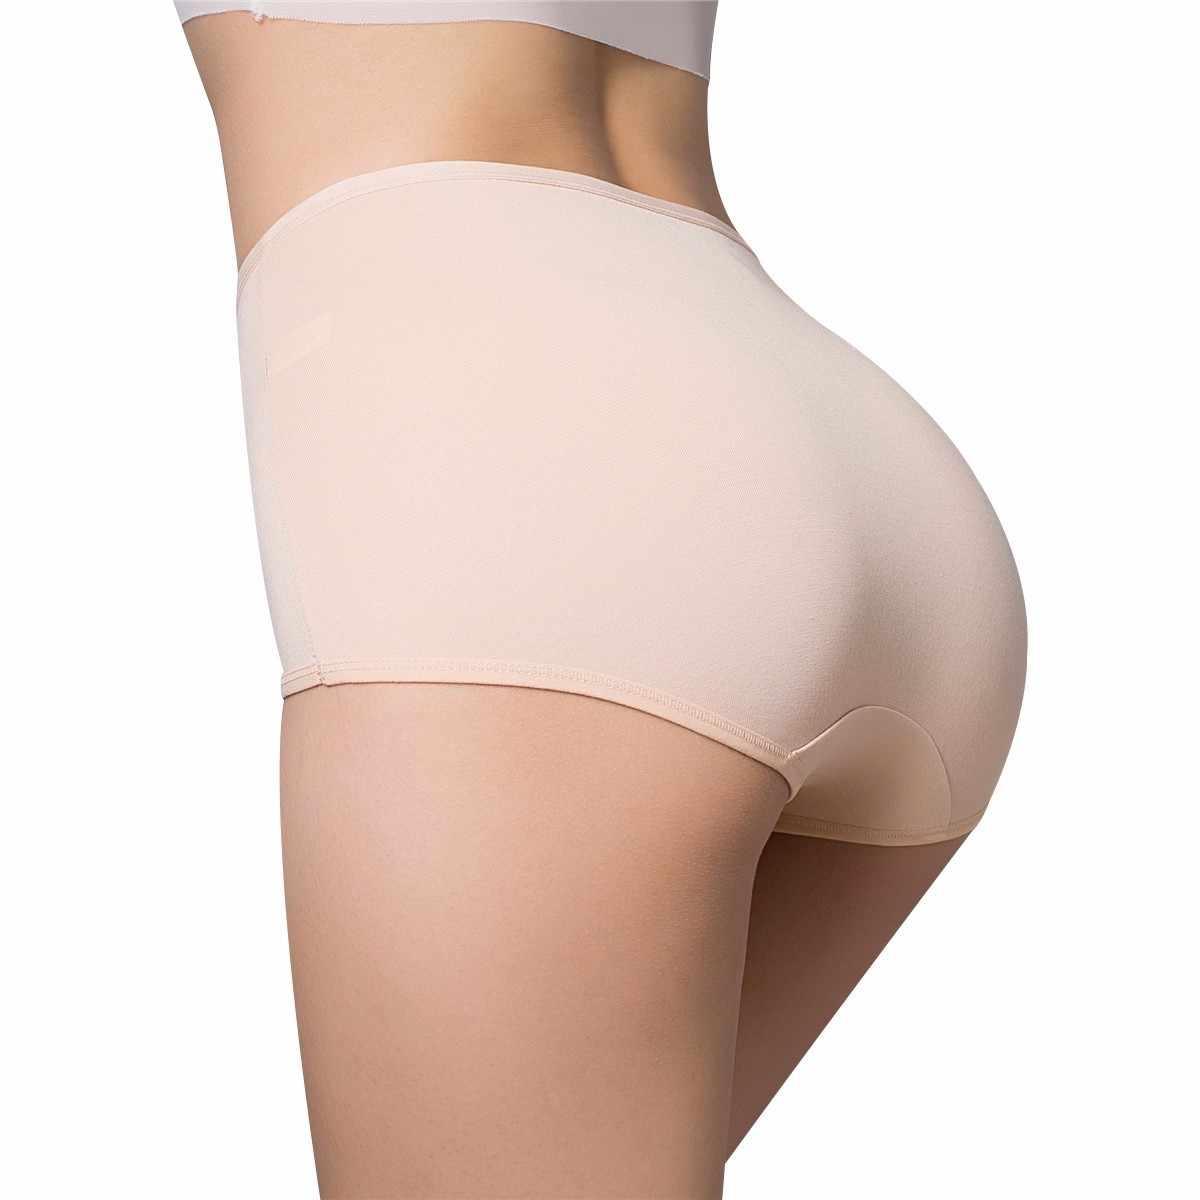 f09f36954e7 2019 winte intimates Women's Panties Ma'am High Waist Triangle Underpants  Non-trace Seamless